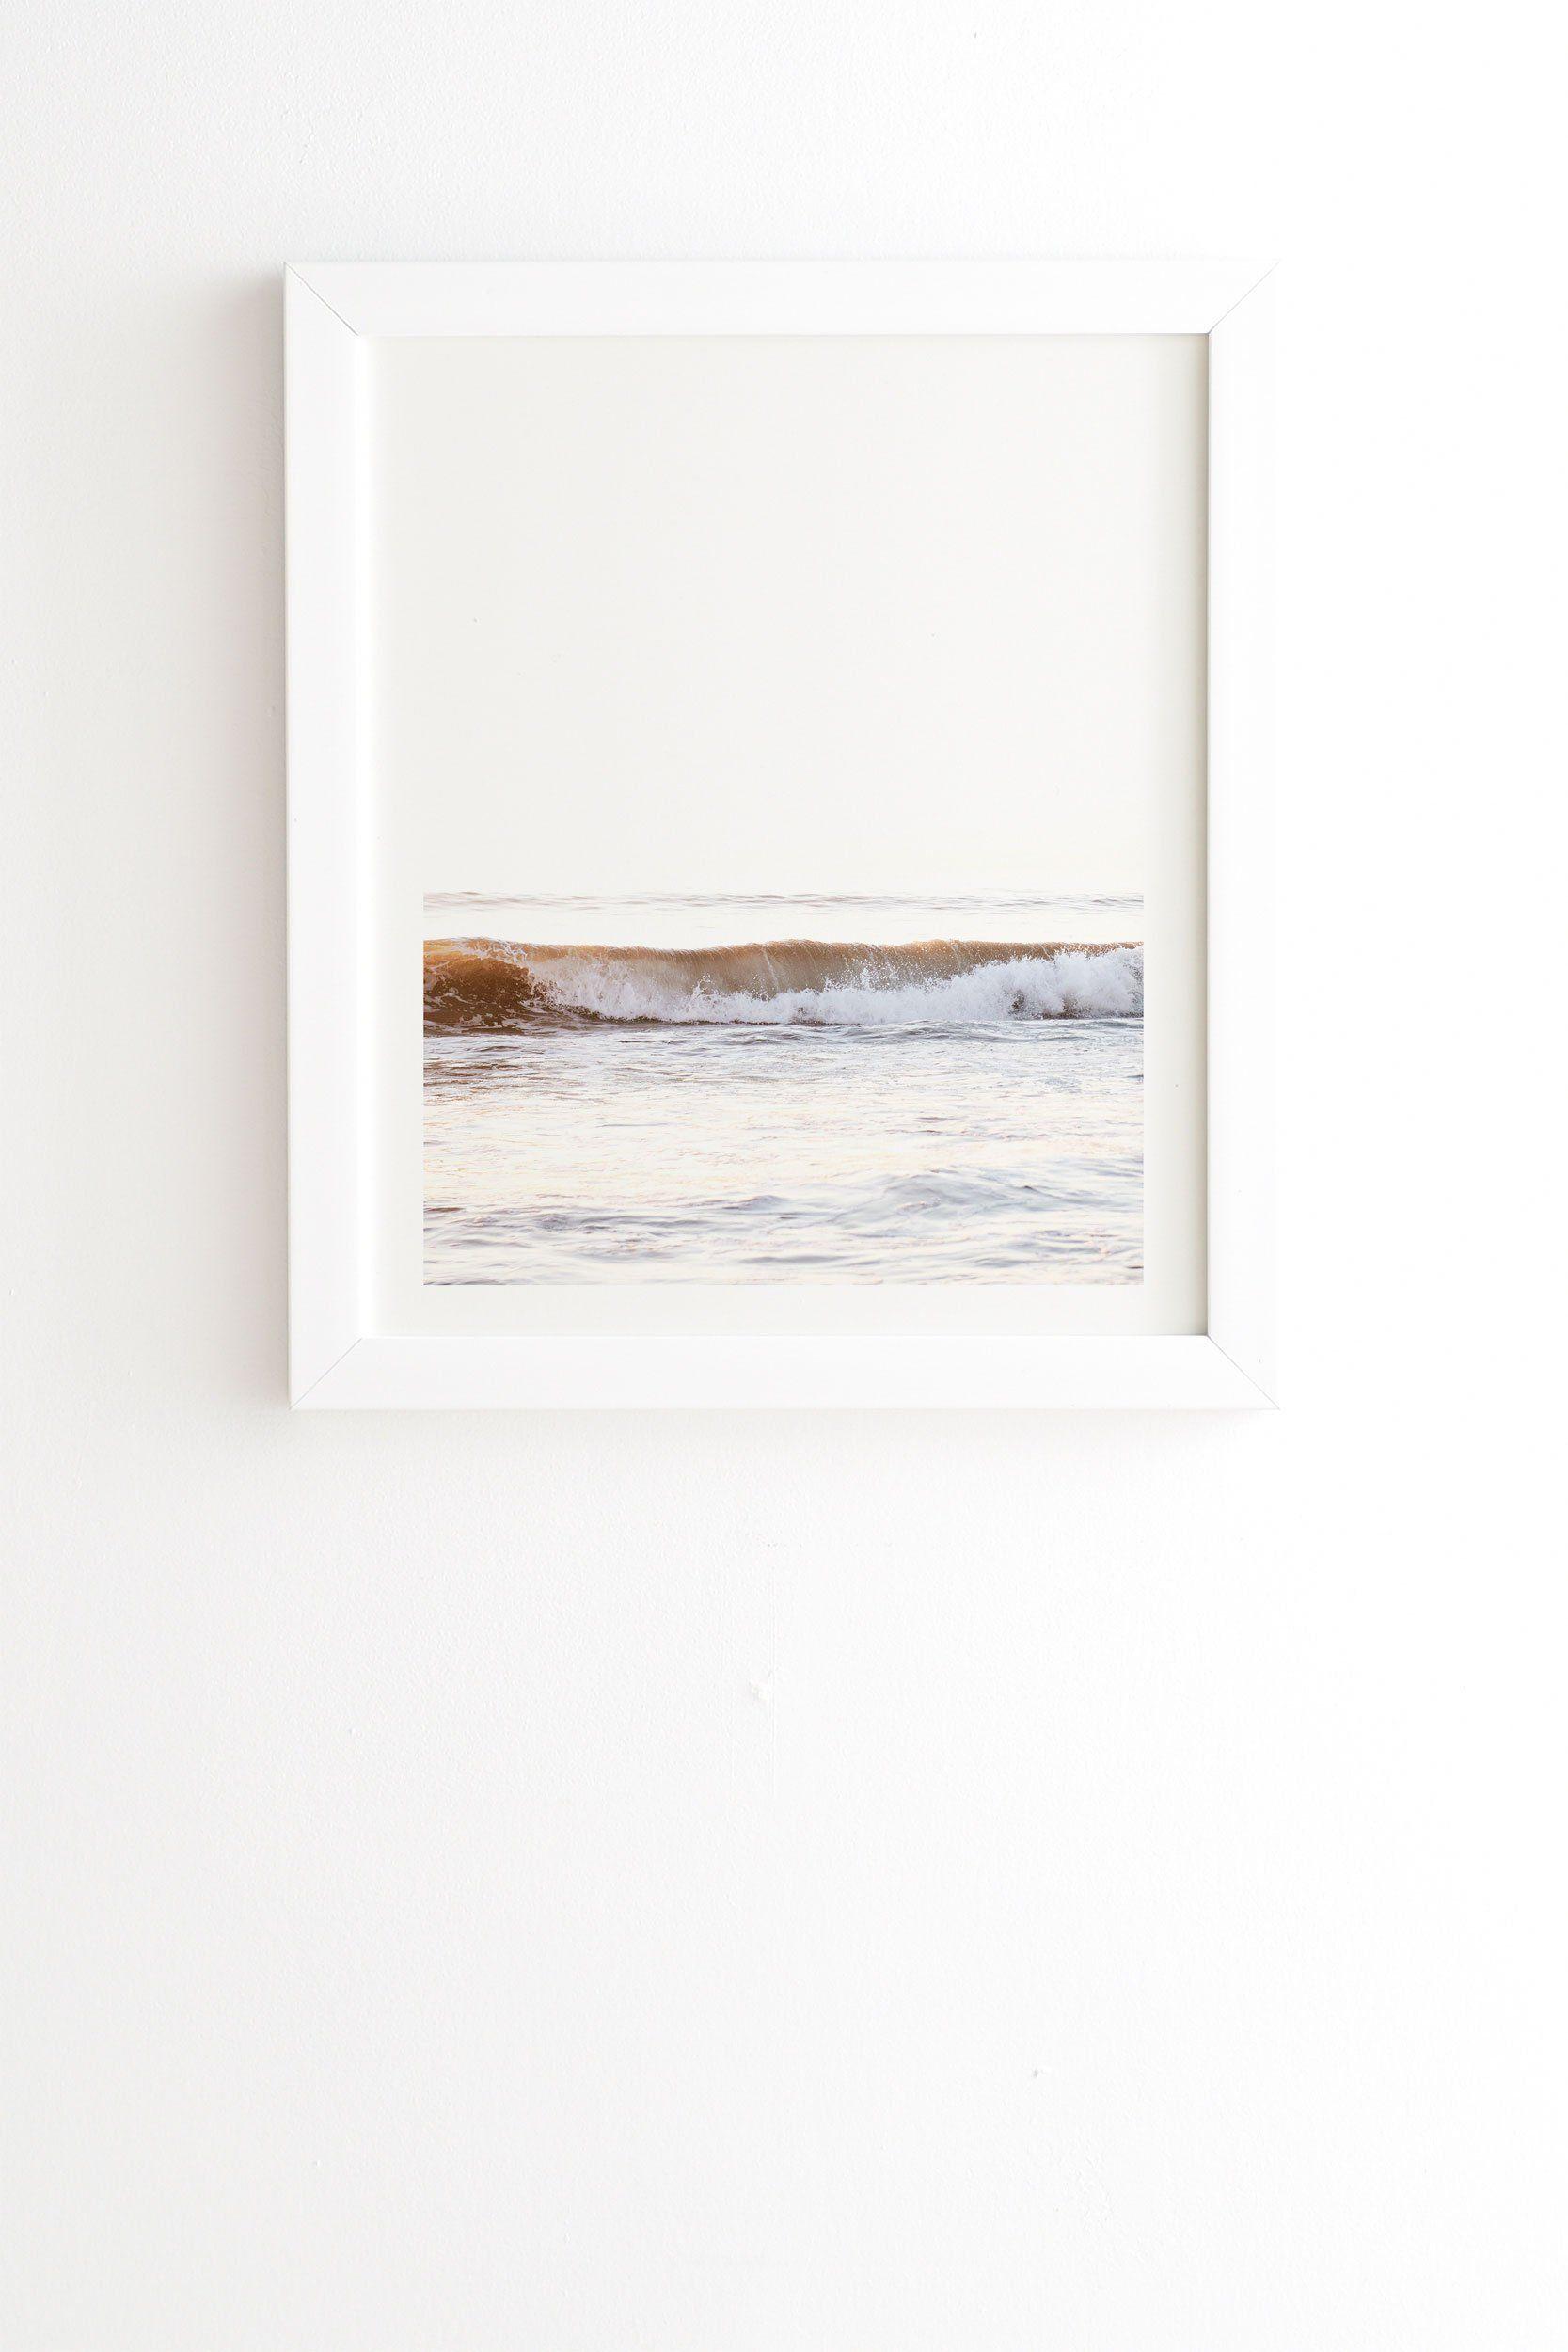 "Framed Wall Art White, Minimalist Wave, 14"" x 16.5"""